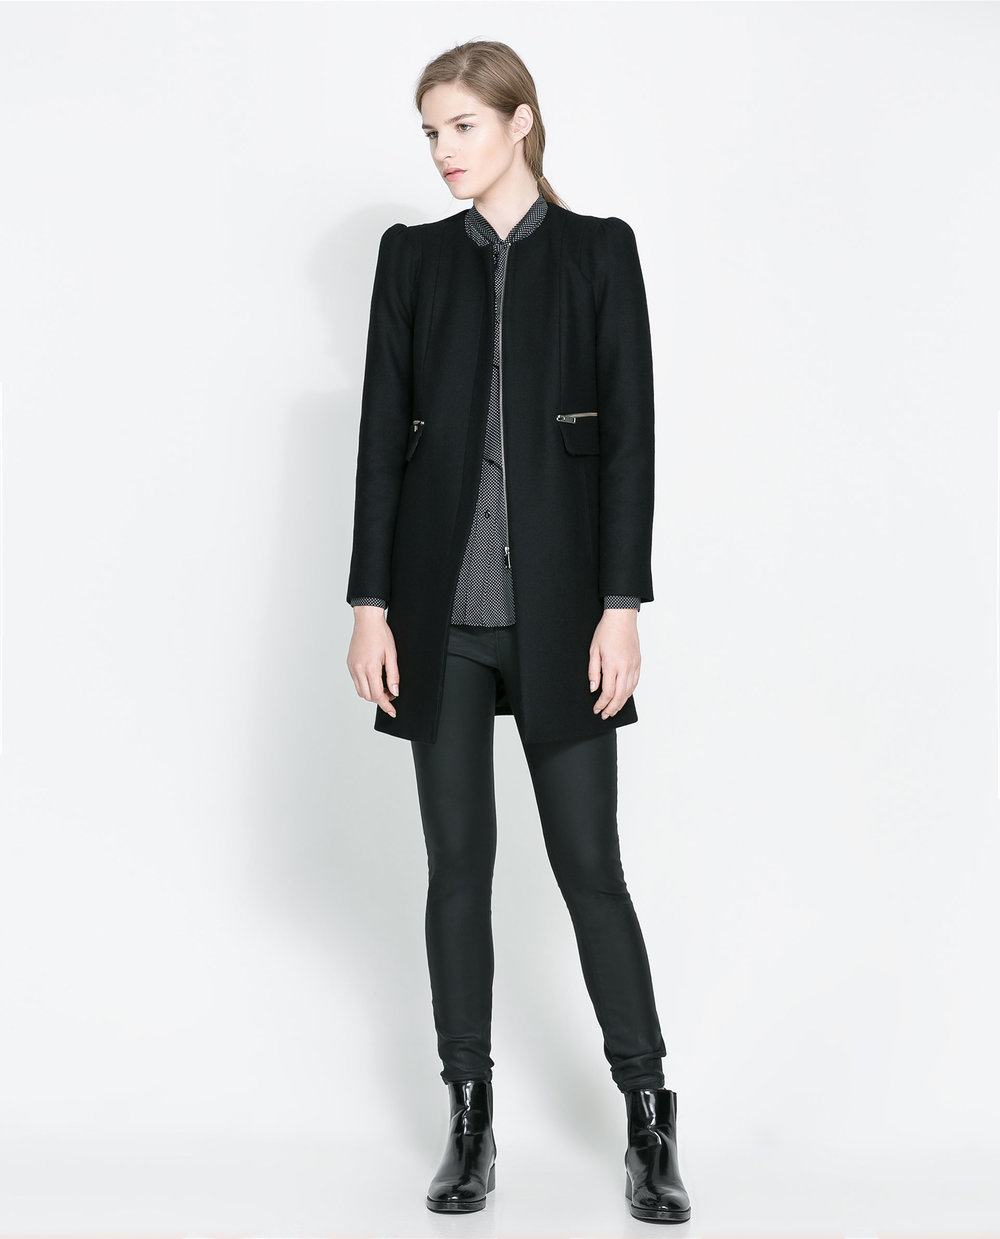 zara-black-loop-knit-woollen-coat-product-1-13968349-323072178.jpeg